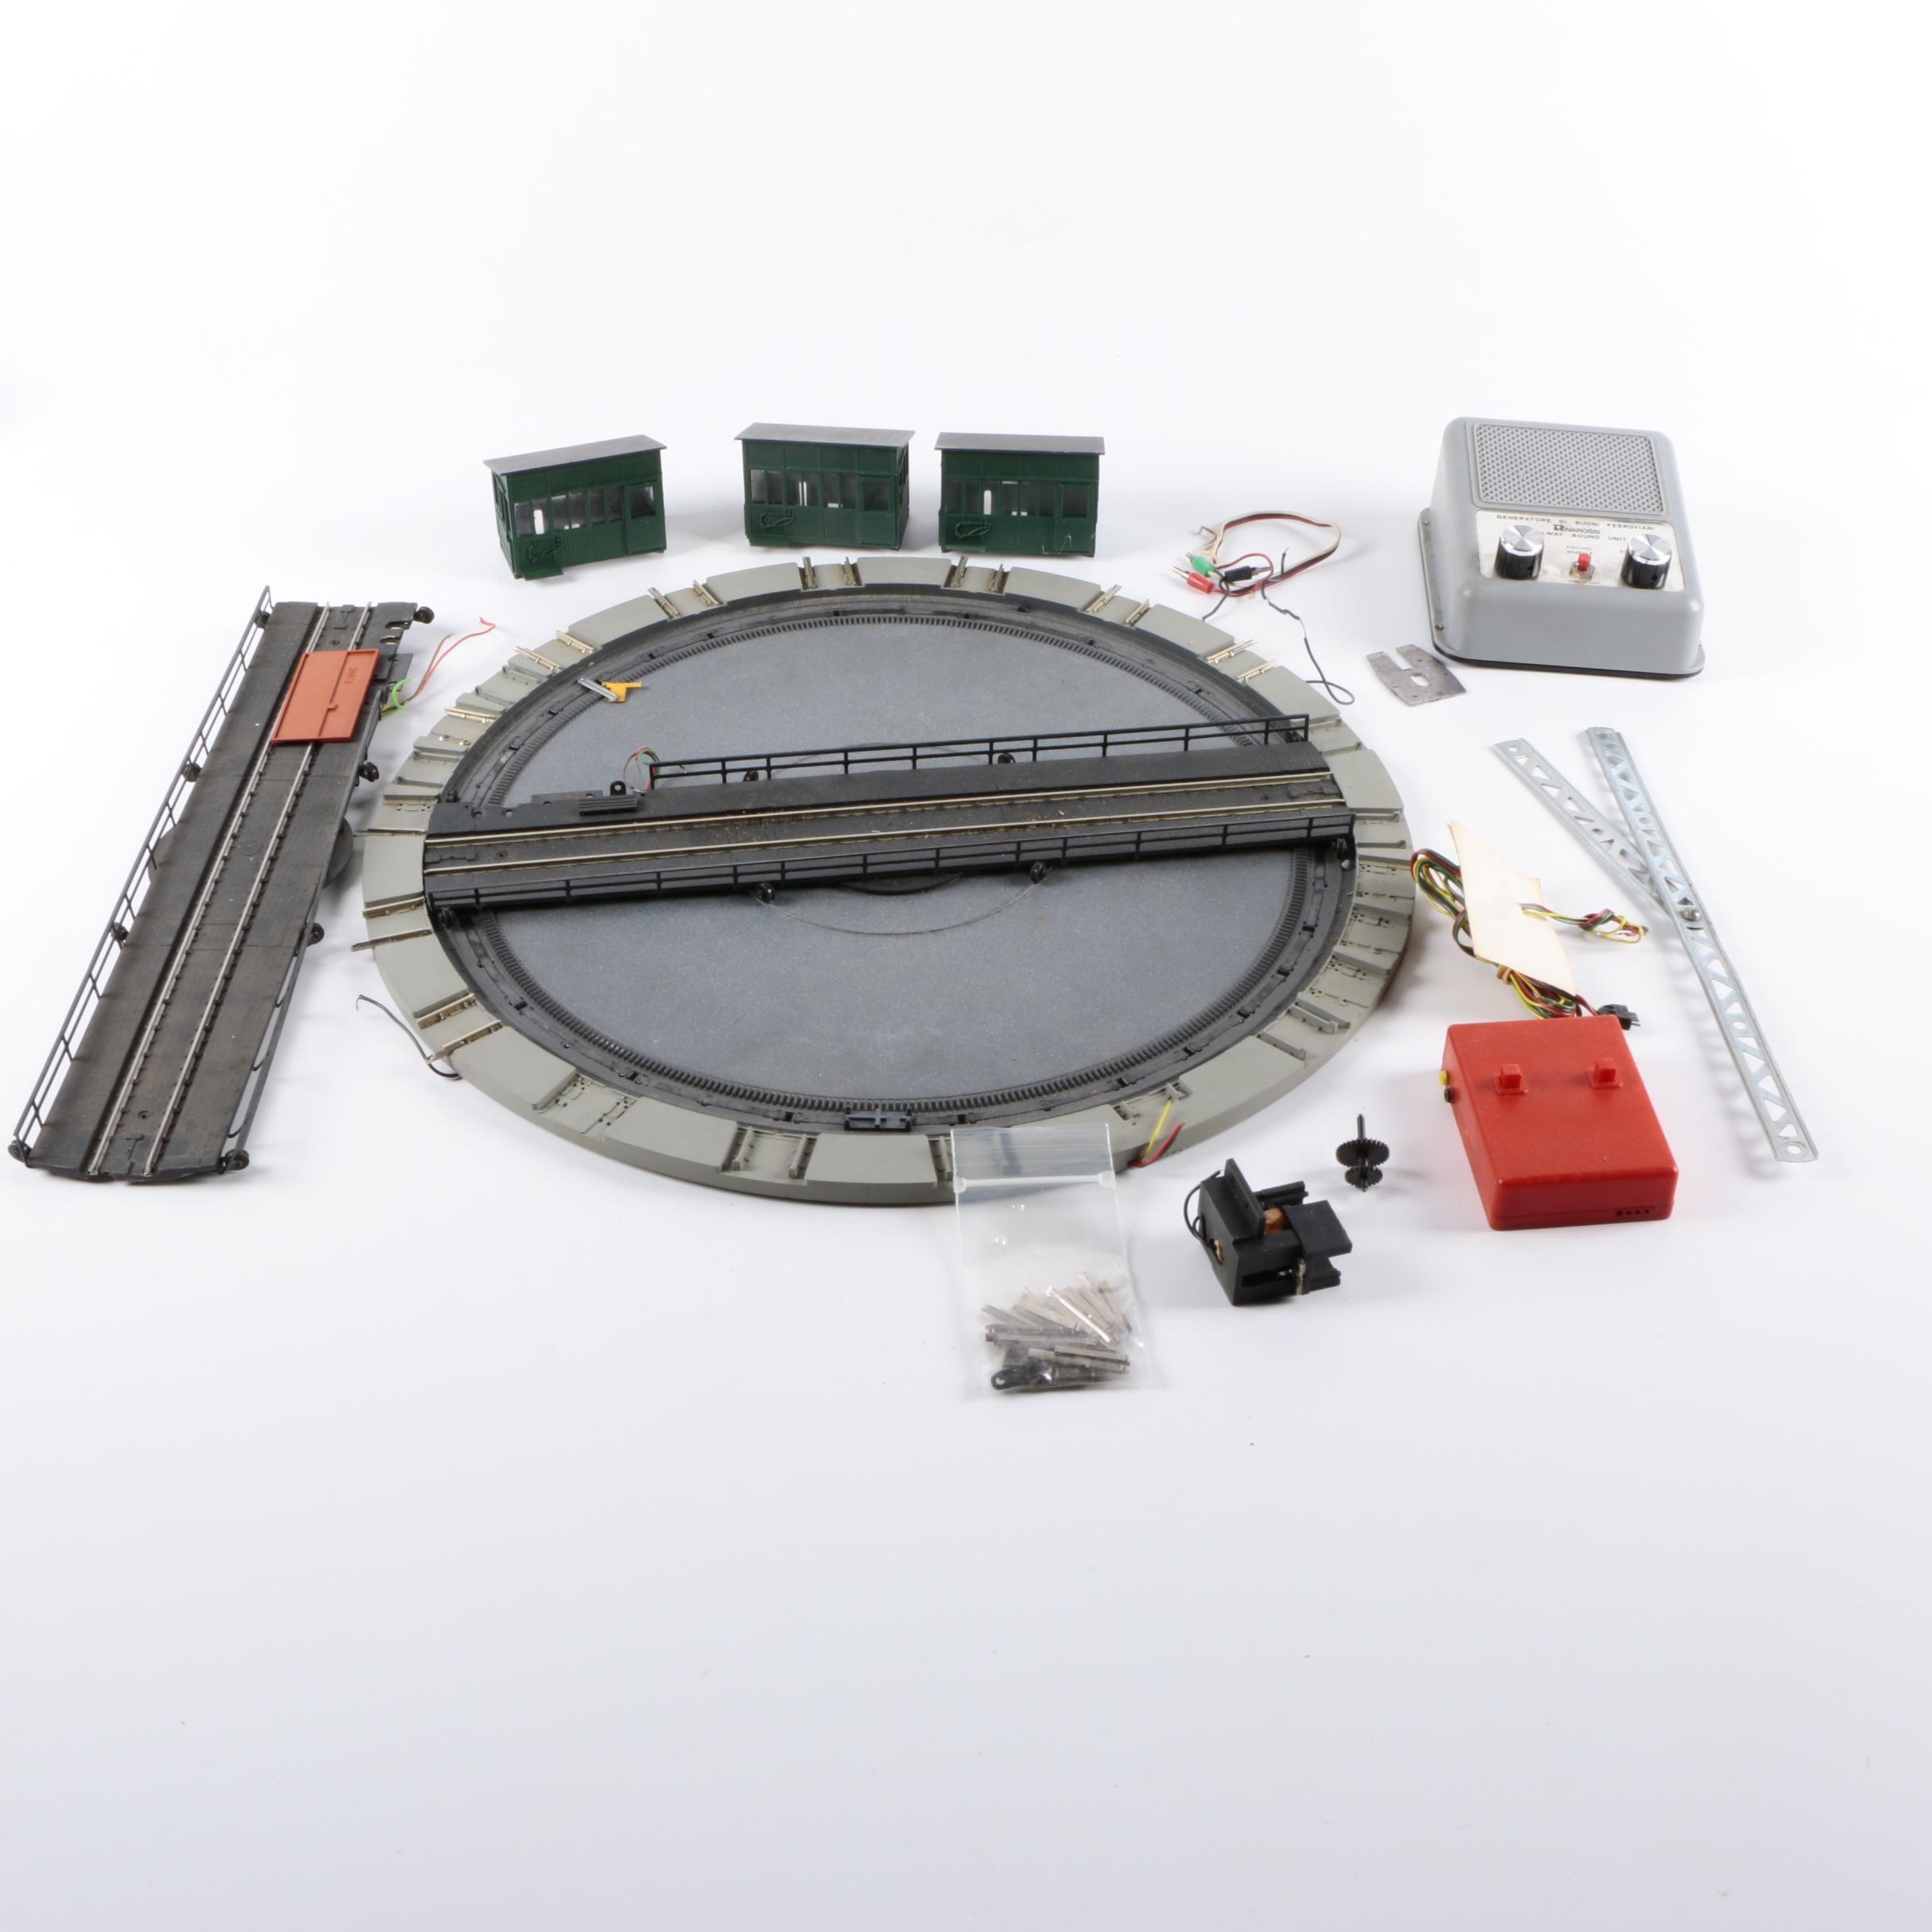 Rivarossi Turntable and Railway Sound Unit